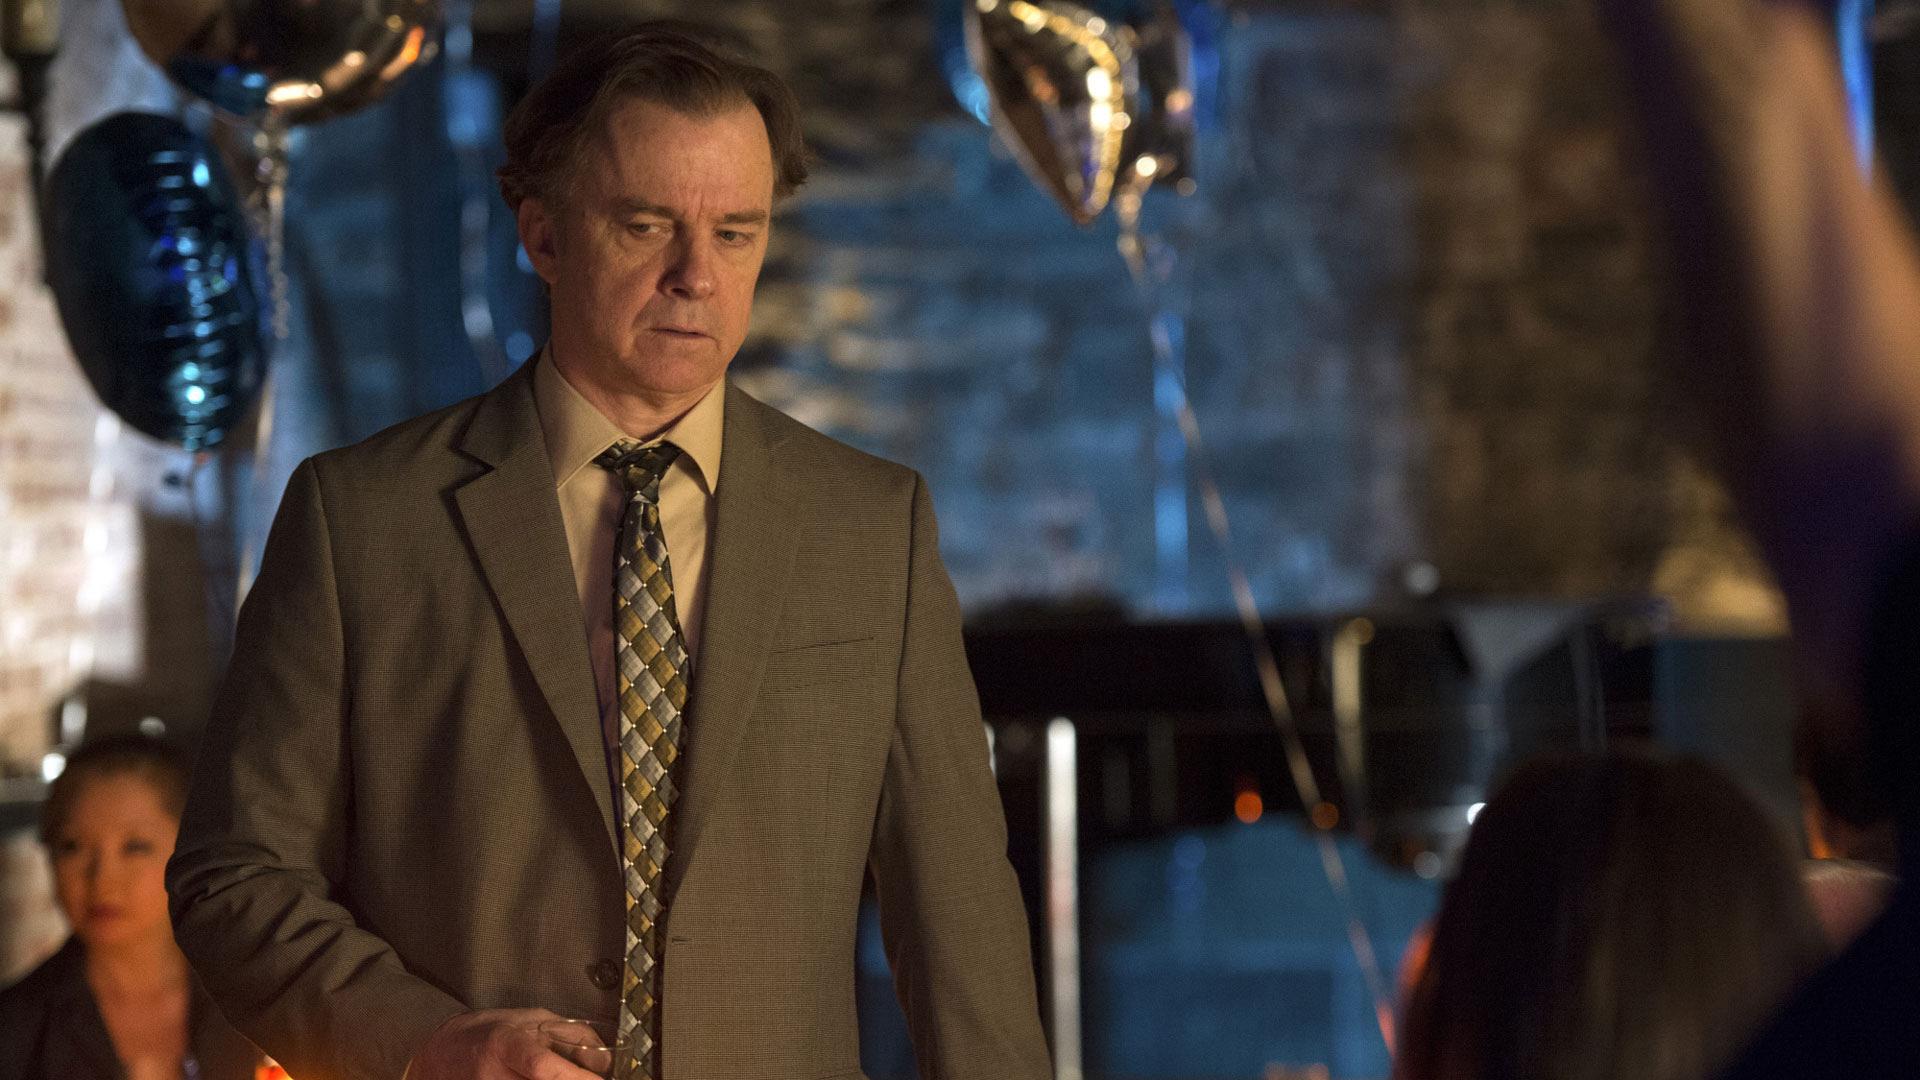 Michael O'Keefe as Lt. Tim Harrison